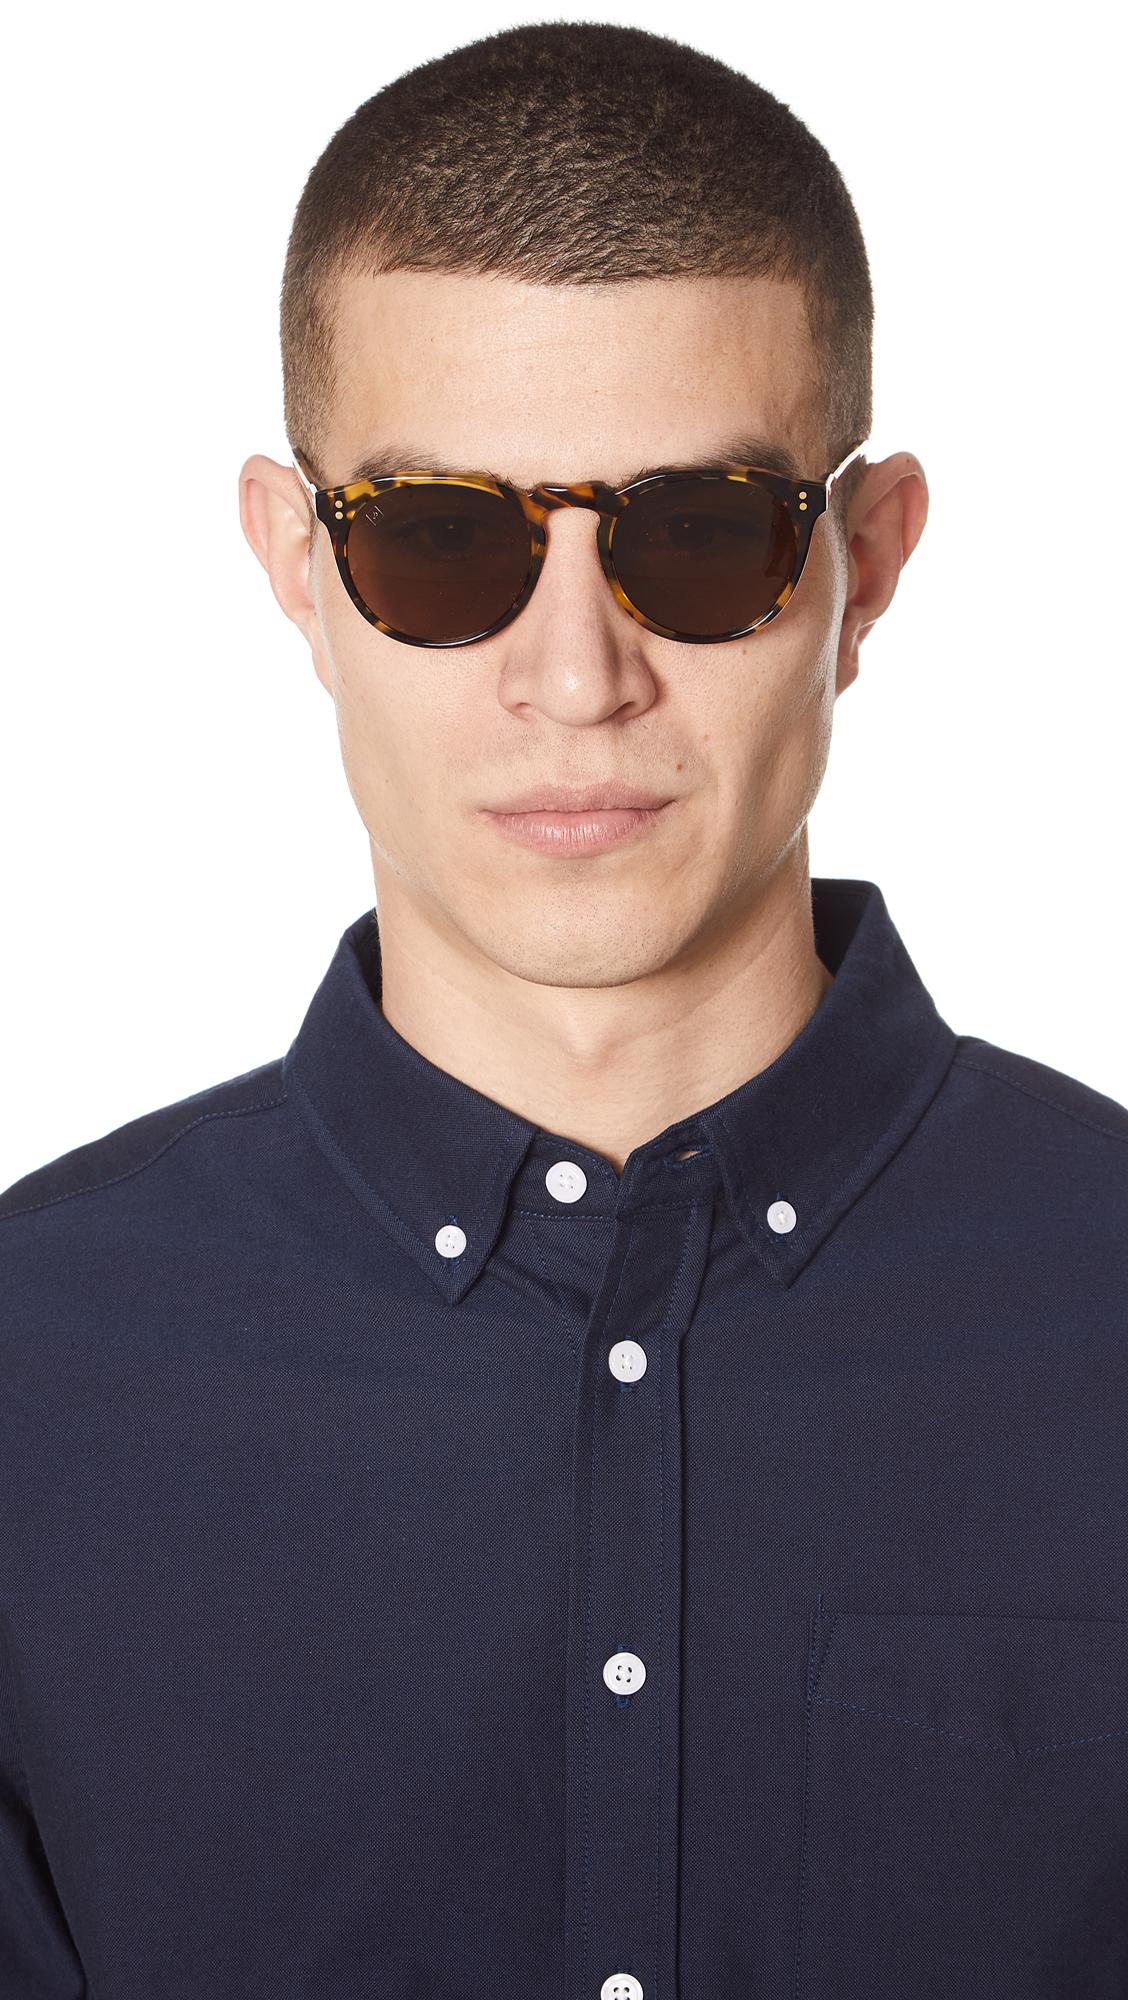 eb44690340 Raen Remmy 49 Polarized Sunglasses